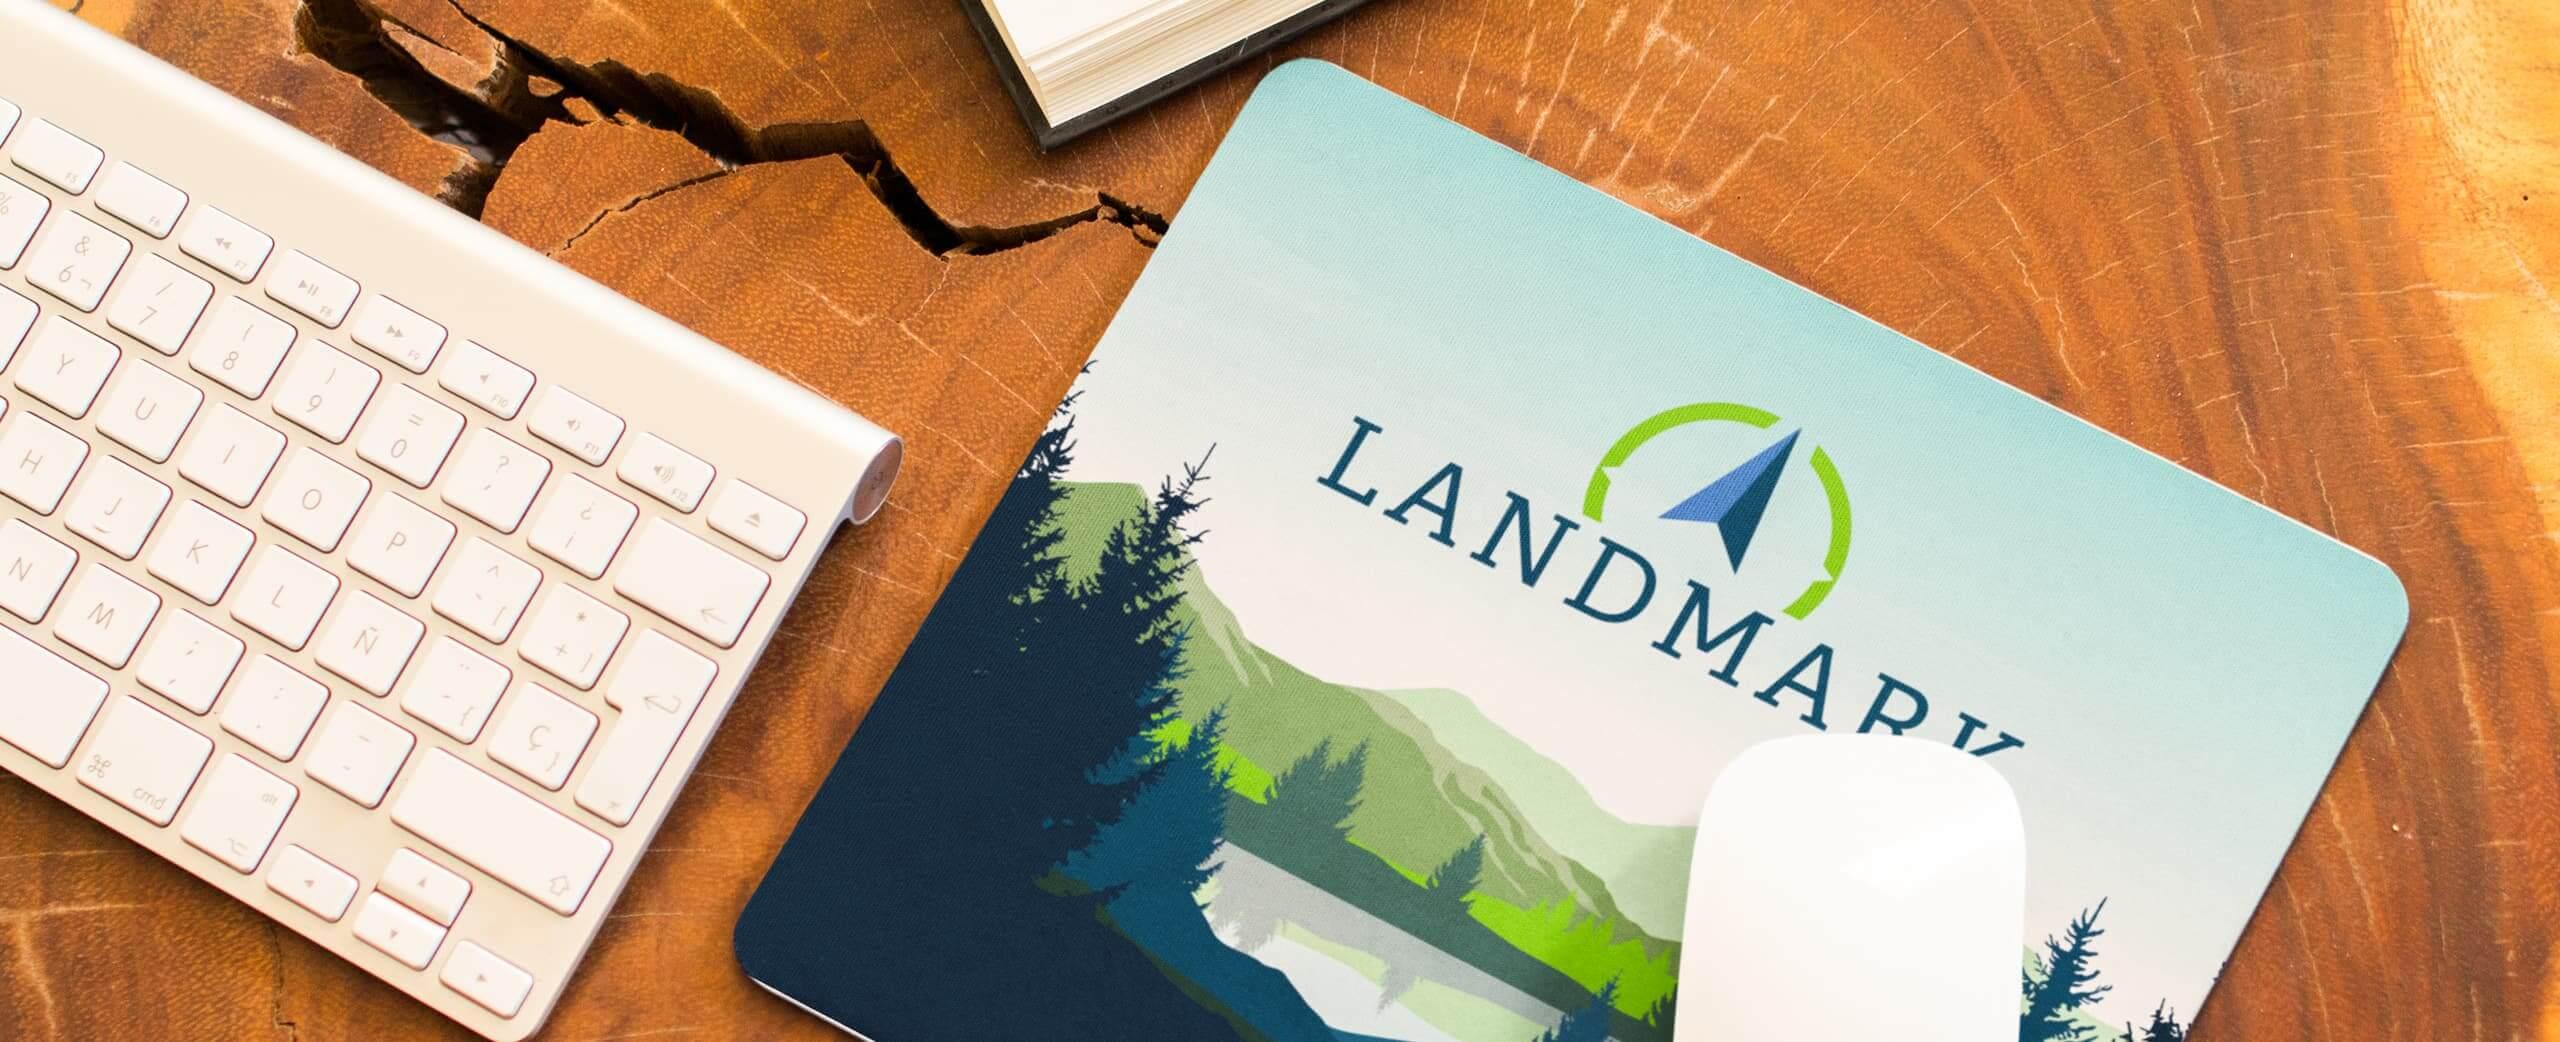 Landmark_mousepad